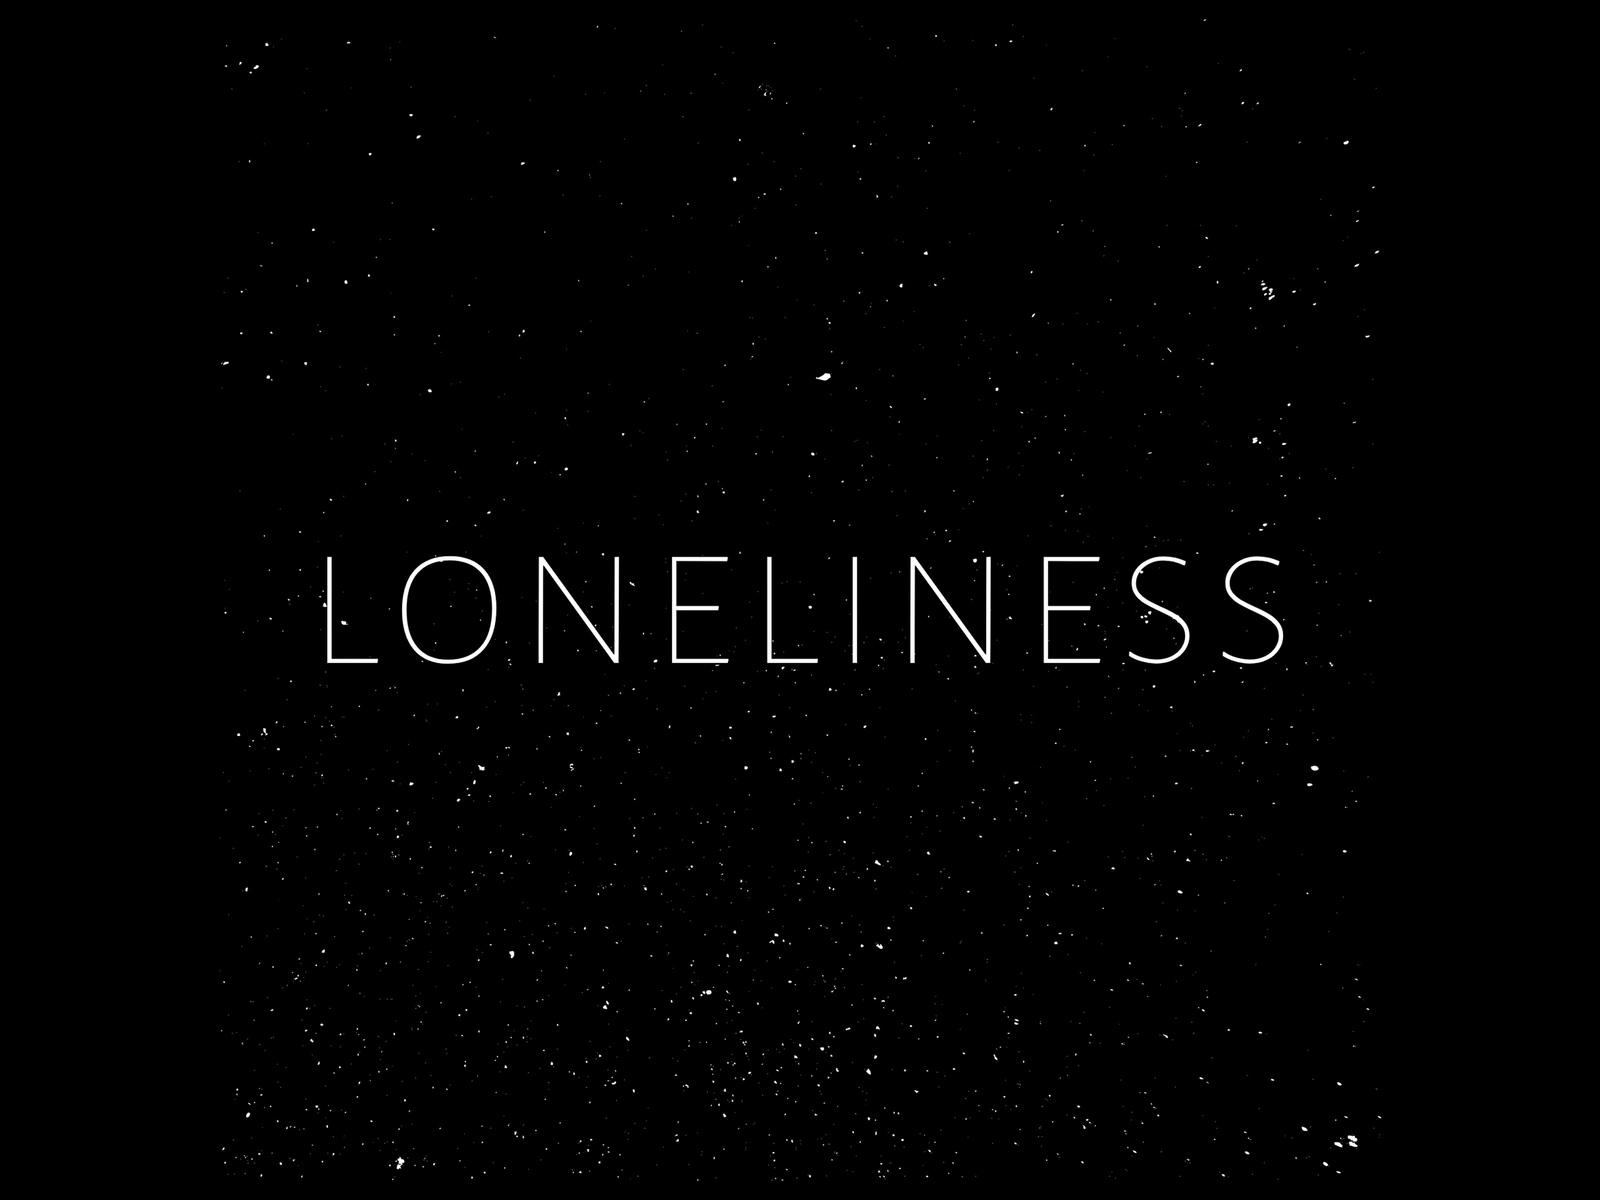 loneliness-typography-4k-ij.jpg